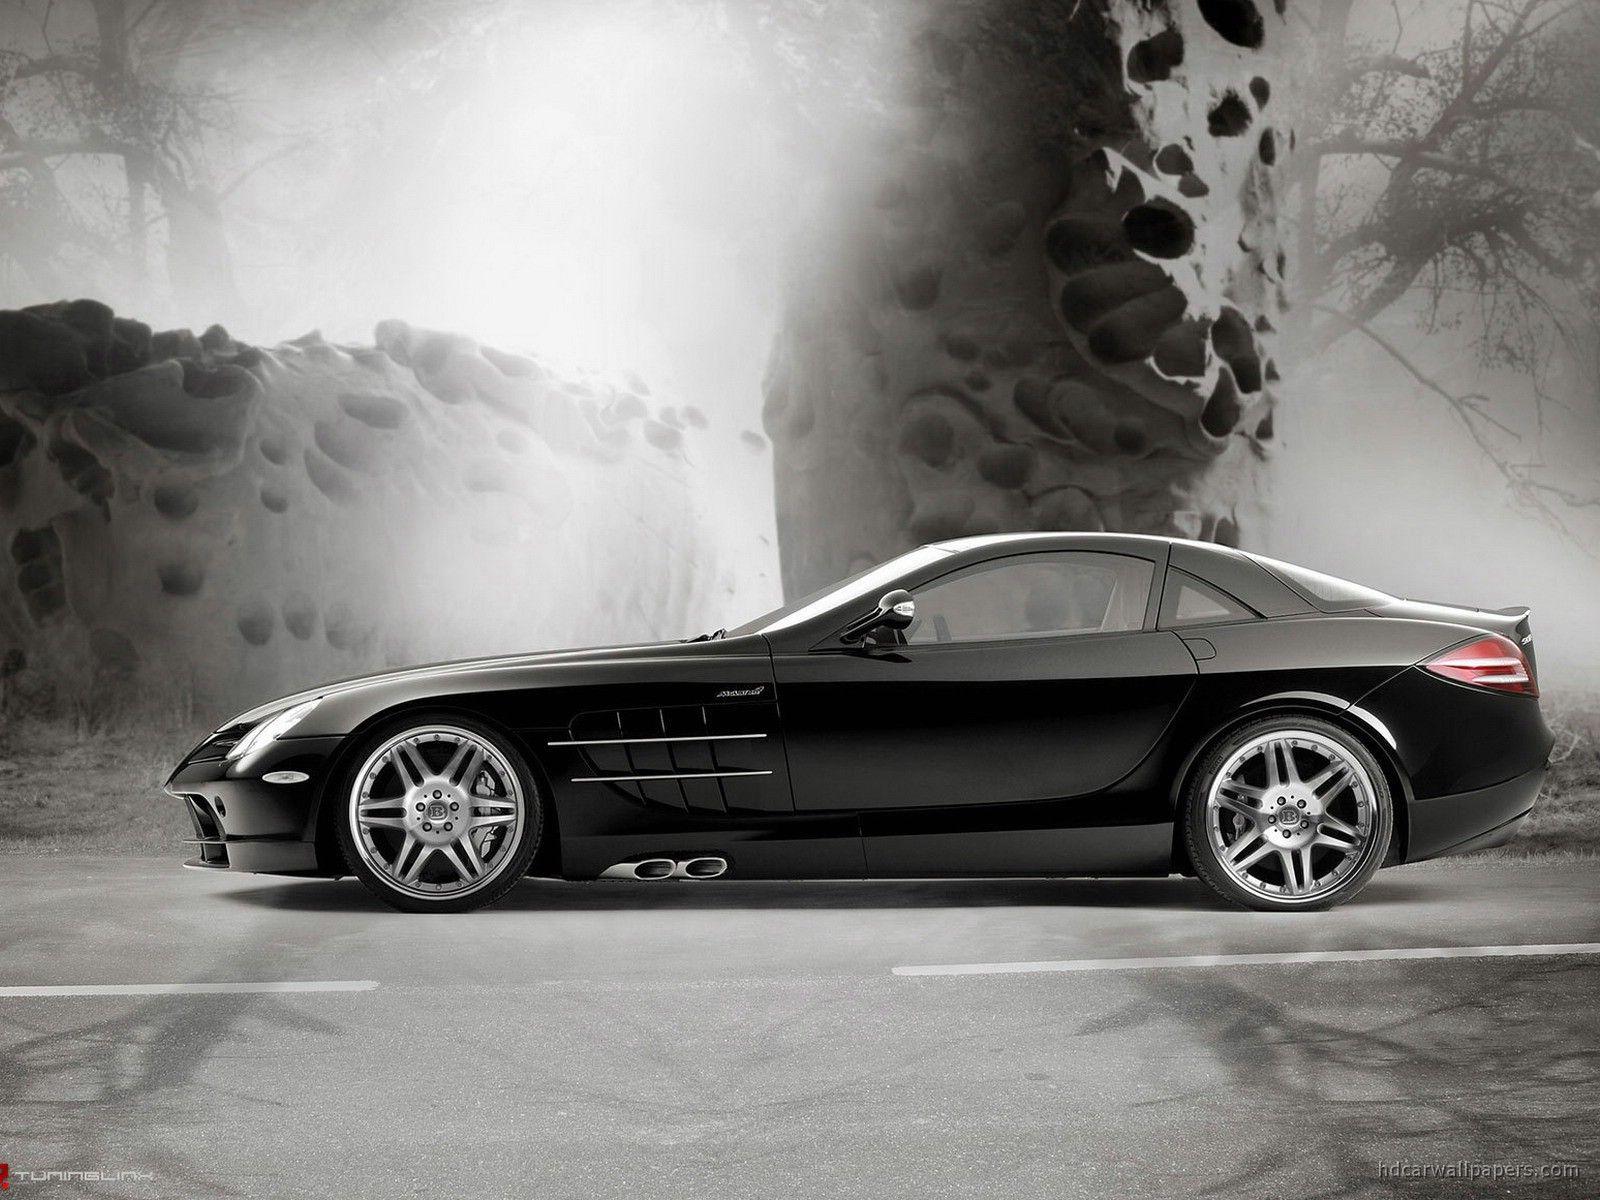 404 Not Found Slr Mclaren Mercedes Slr Mercedes Benz Mclaren